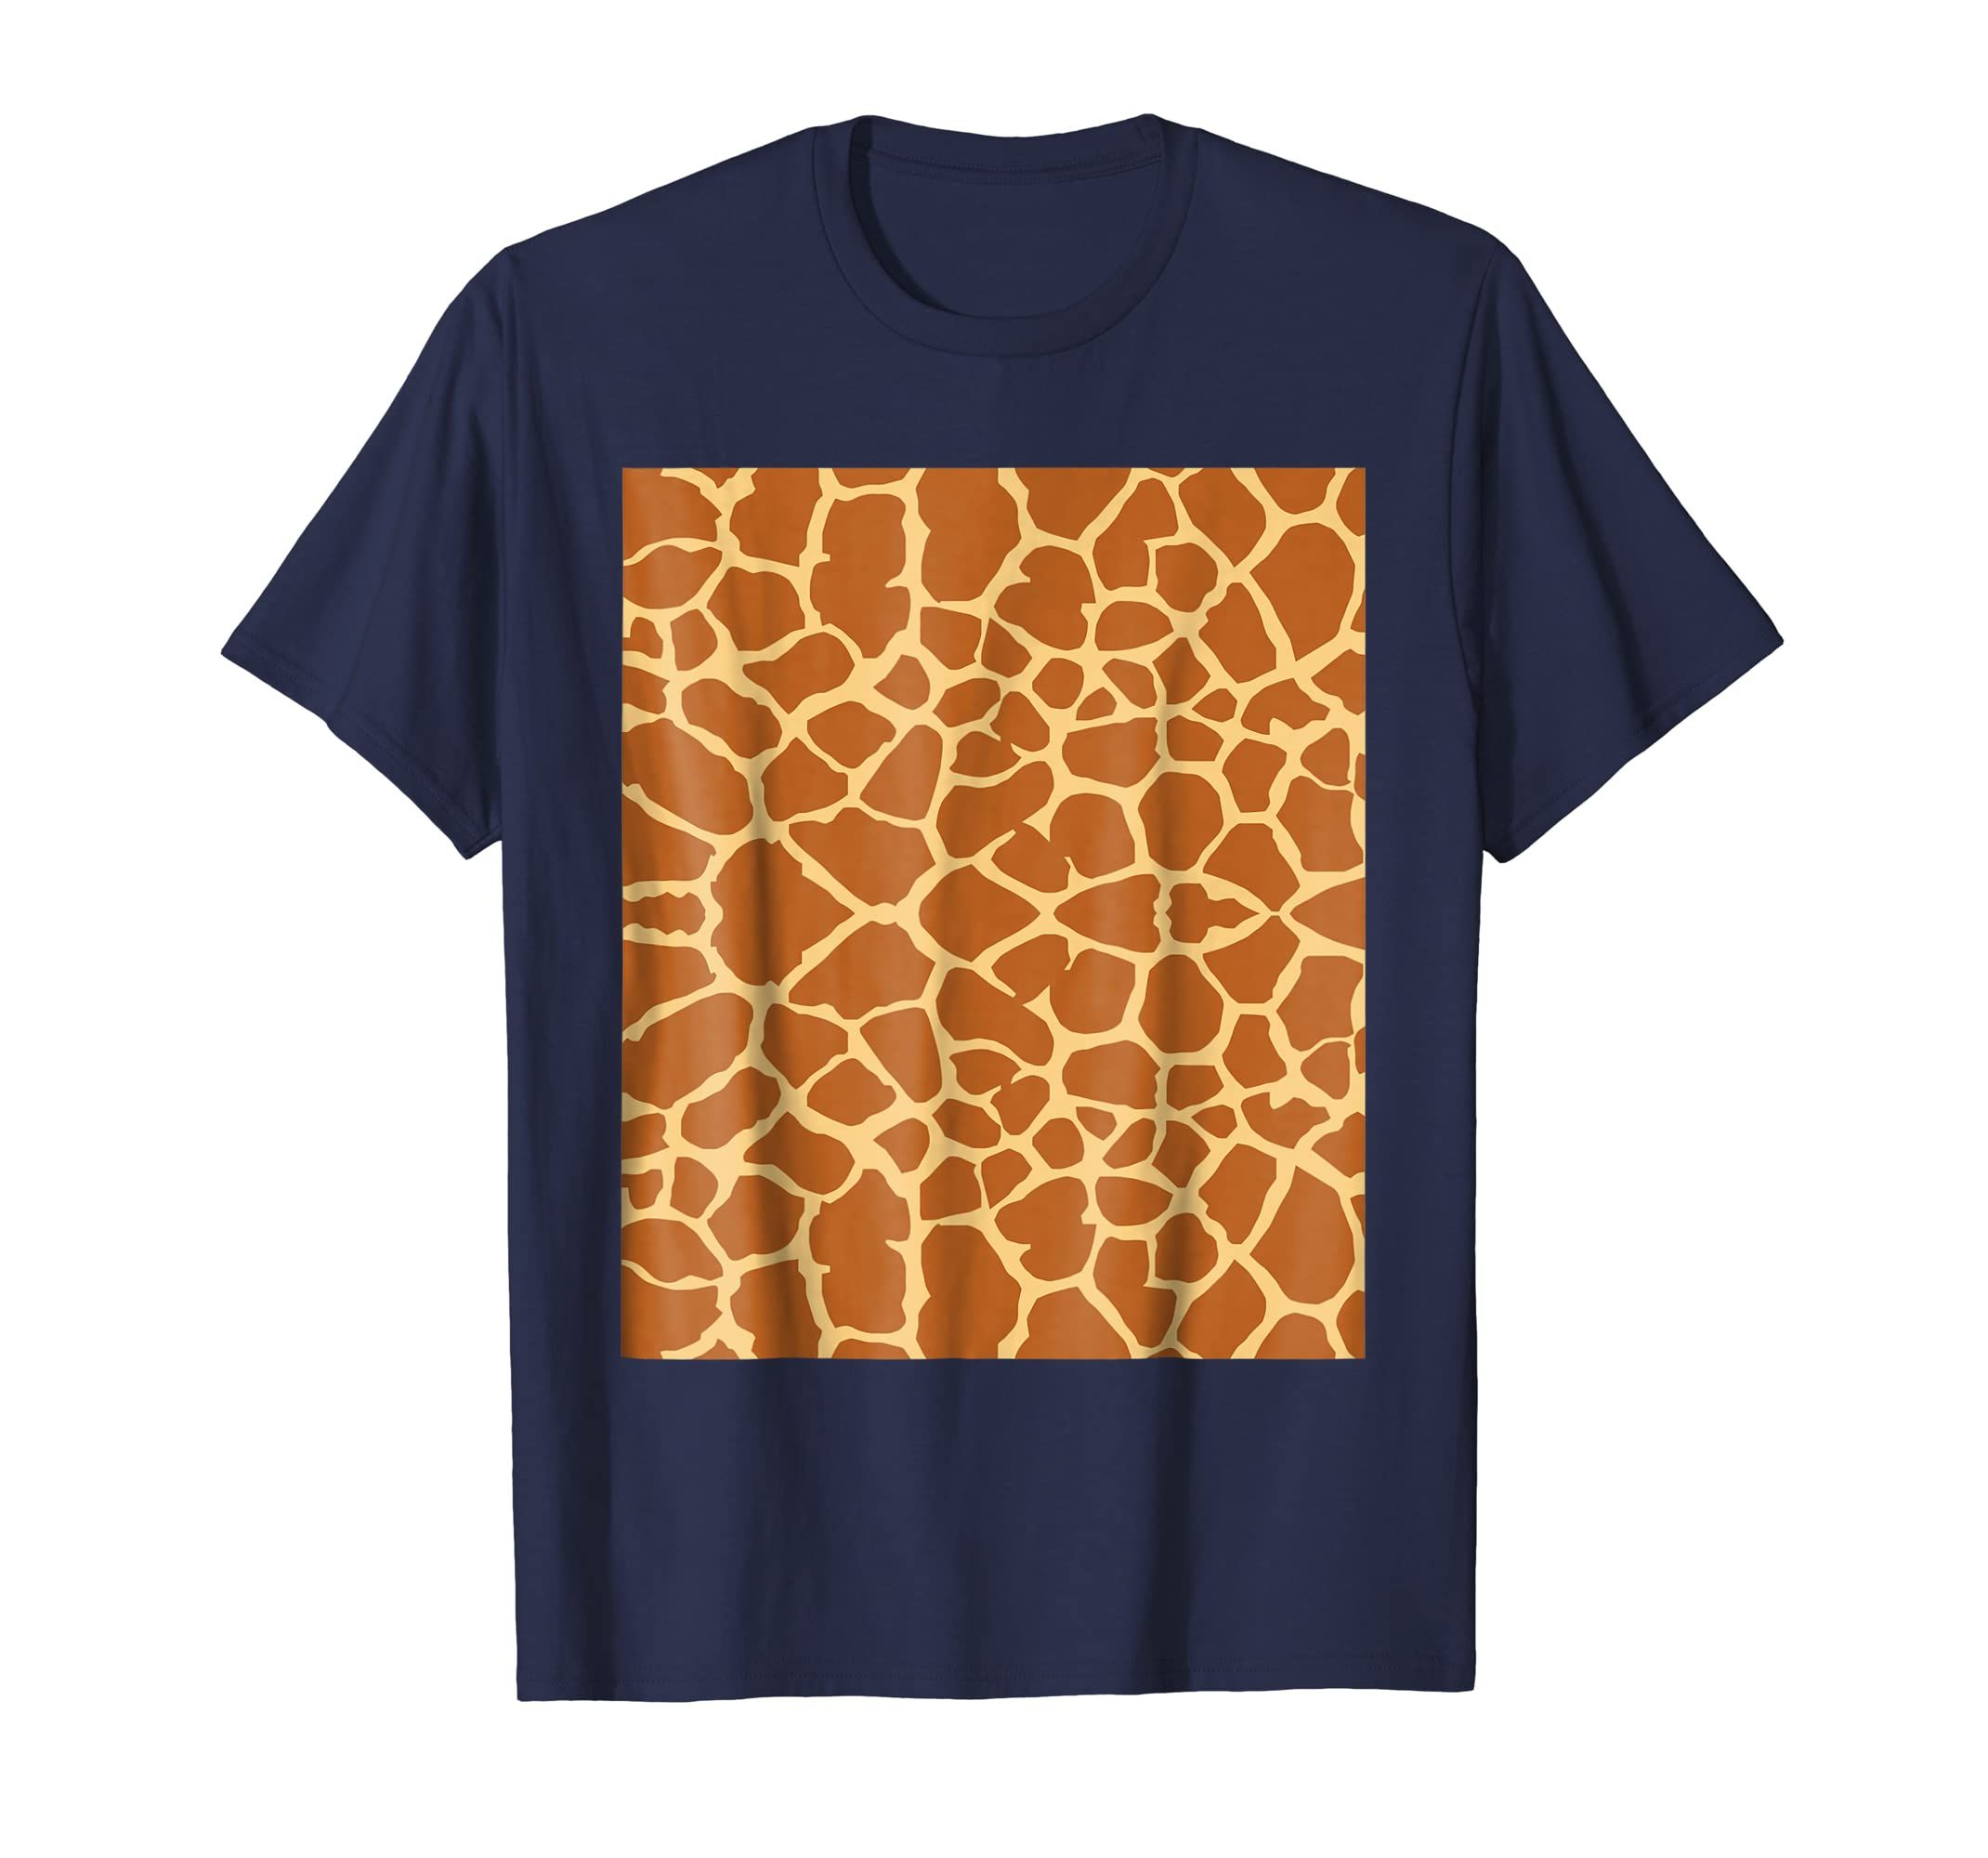 Giraffe Print T Shirt Giraffe Pattern Costume Gift Shirt-Teechatpro